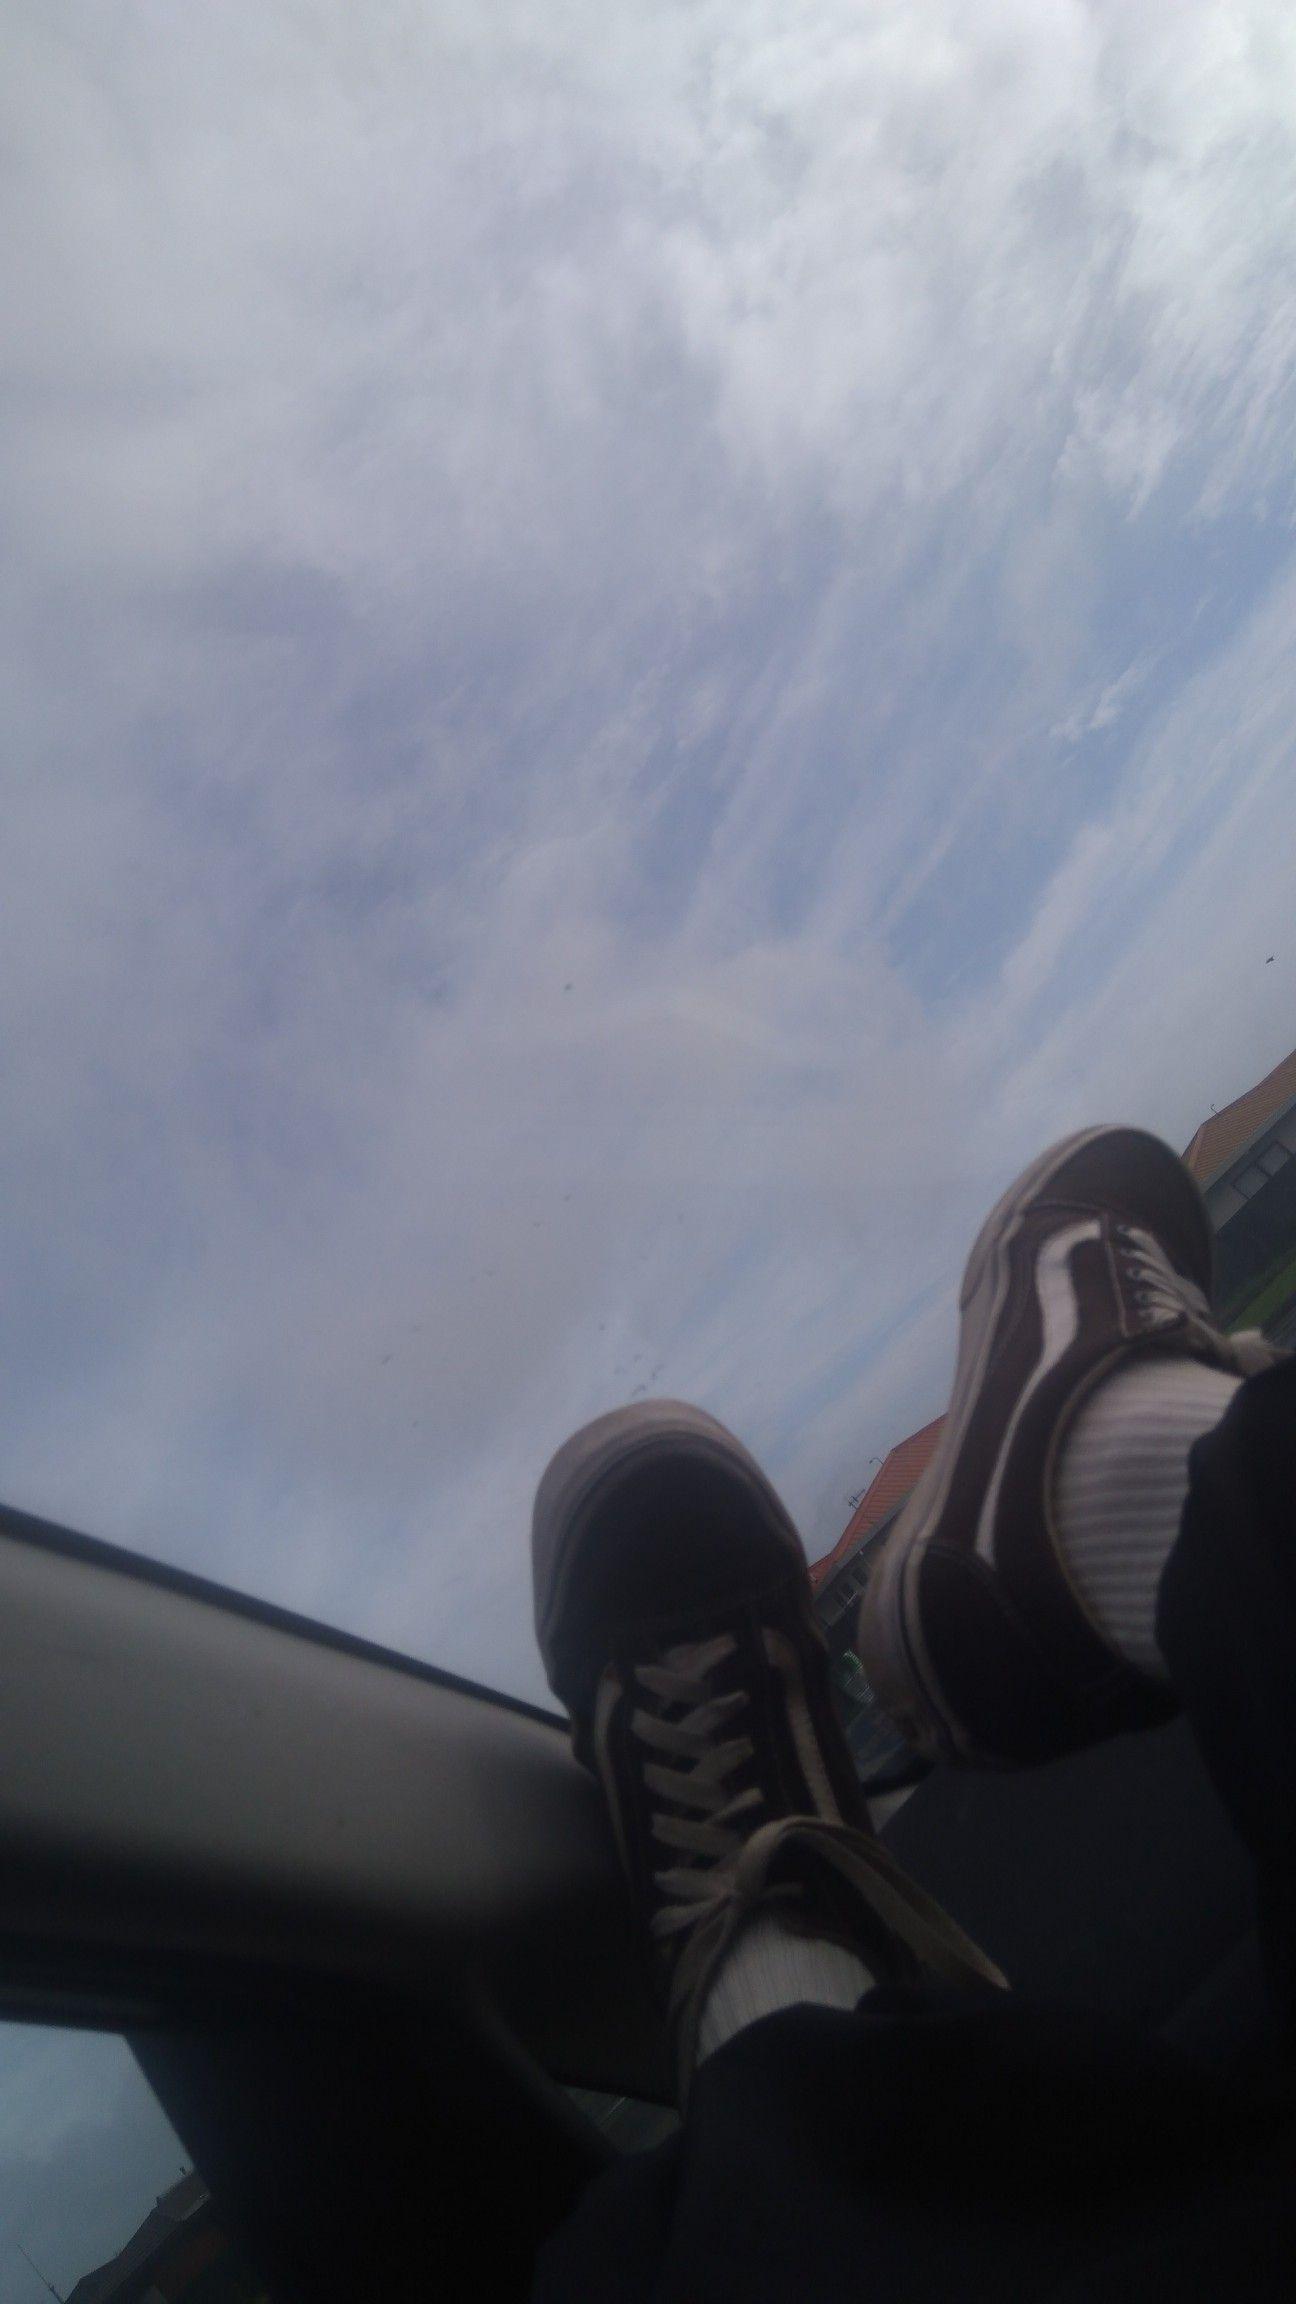 Just a van day Sky car, Van, Vans